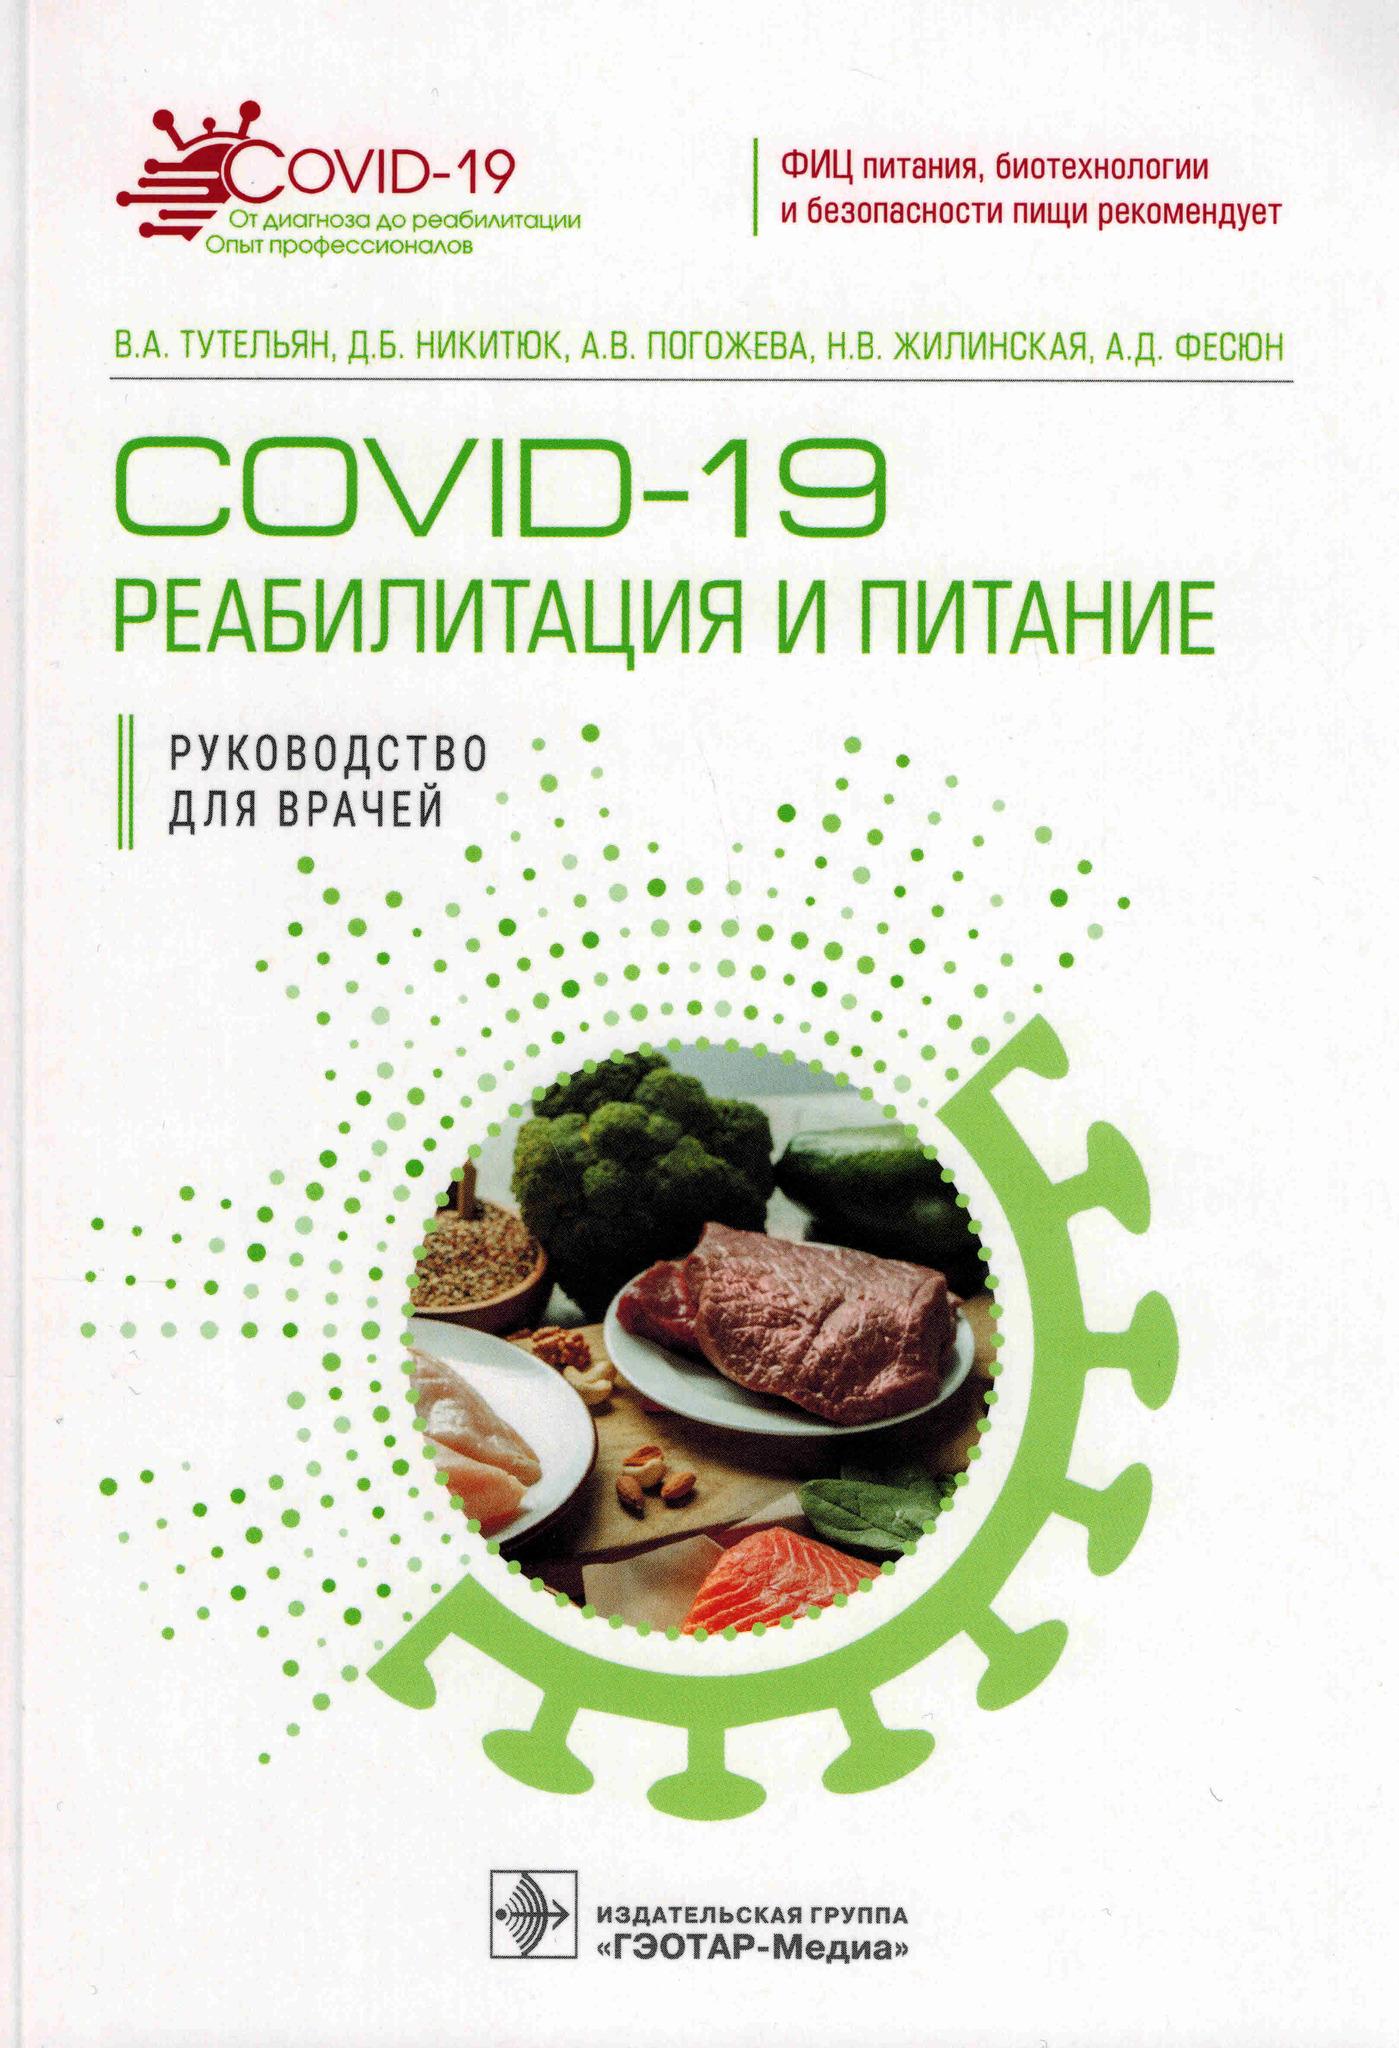 Новинки COVID-19: реабилитация и питание. Руководство для врачей covid19.jpg